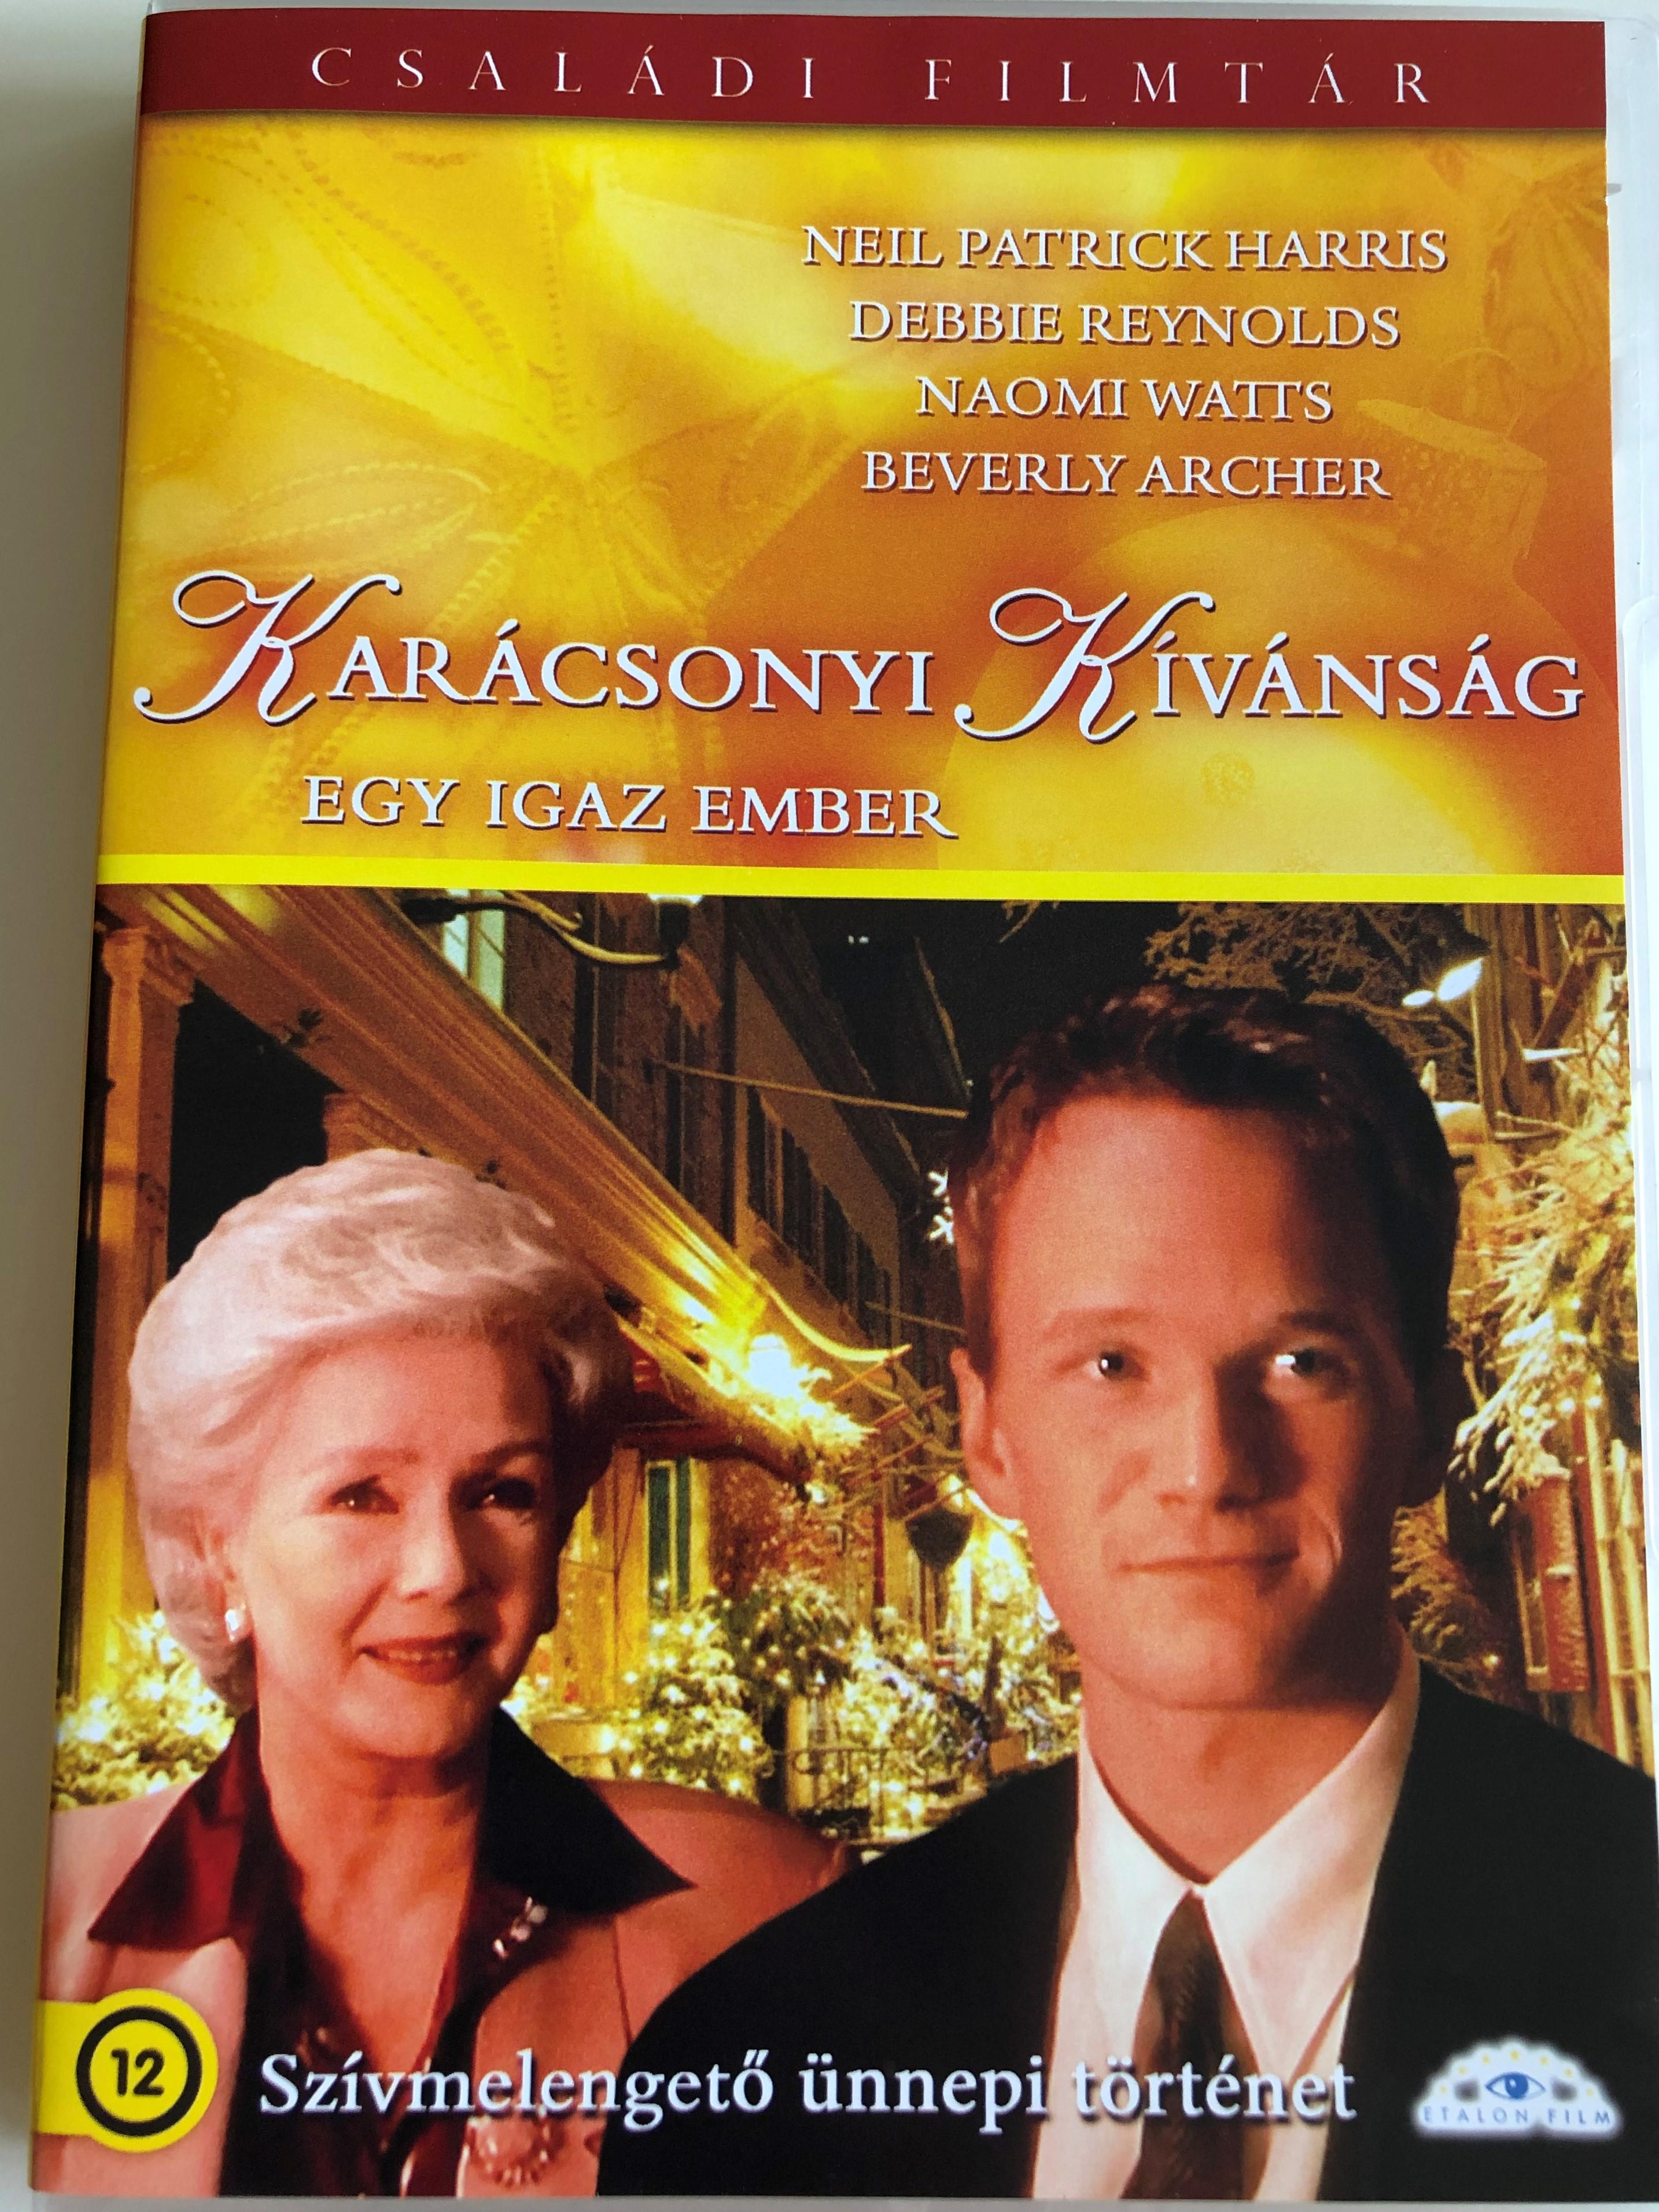 the-christmas-wish-dvd-1998-kar-csonyi-k-v-ns-g-egy-igaz-ember-directed-by-ian-barry-starring-neil-patrick-harris-debbie-reynolds-naomi-watts-1-.jpg